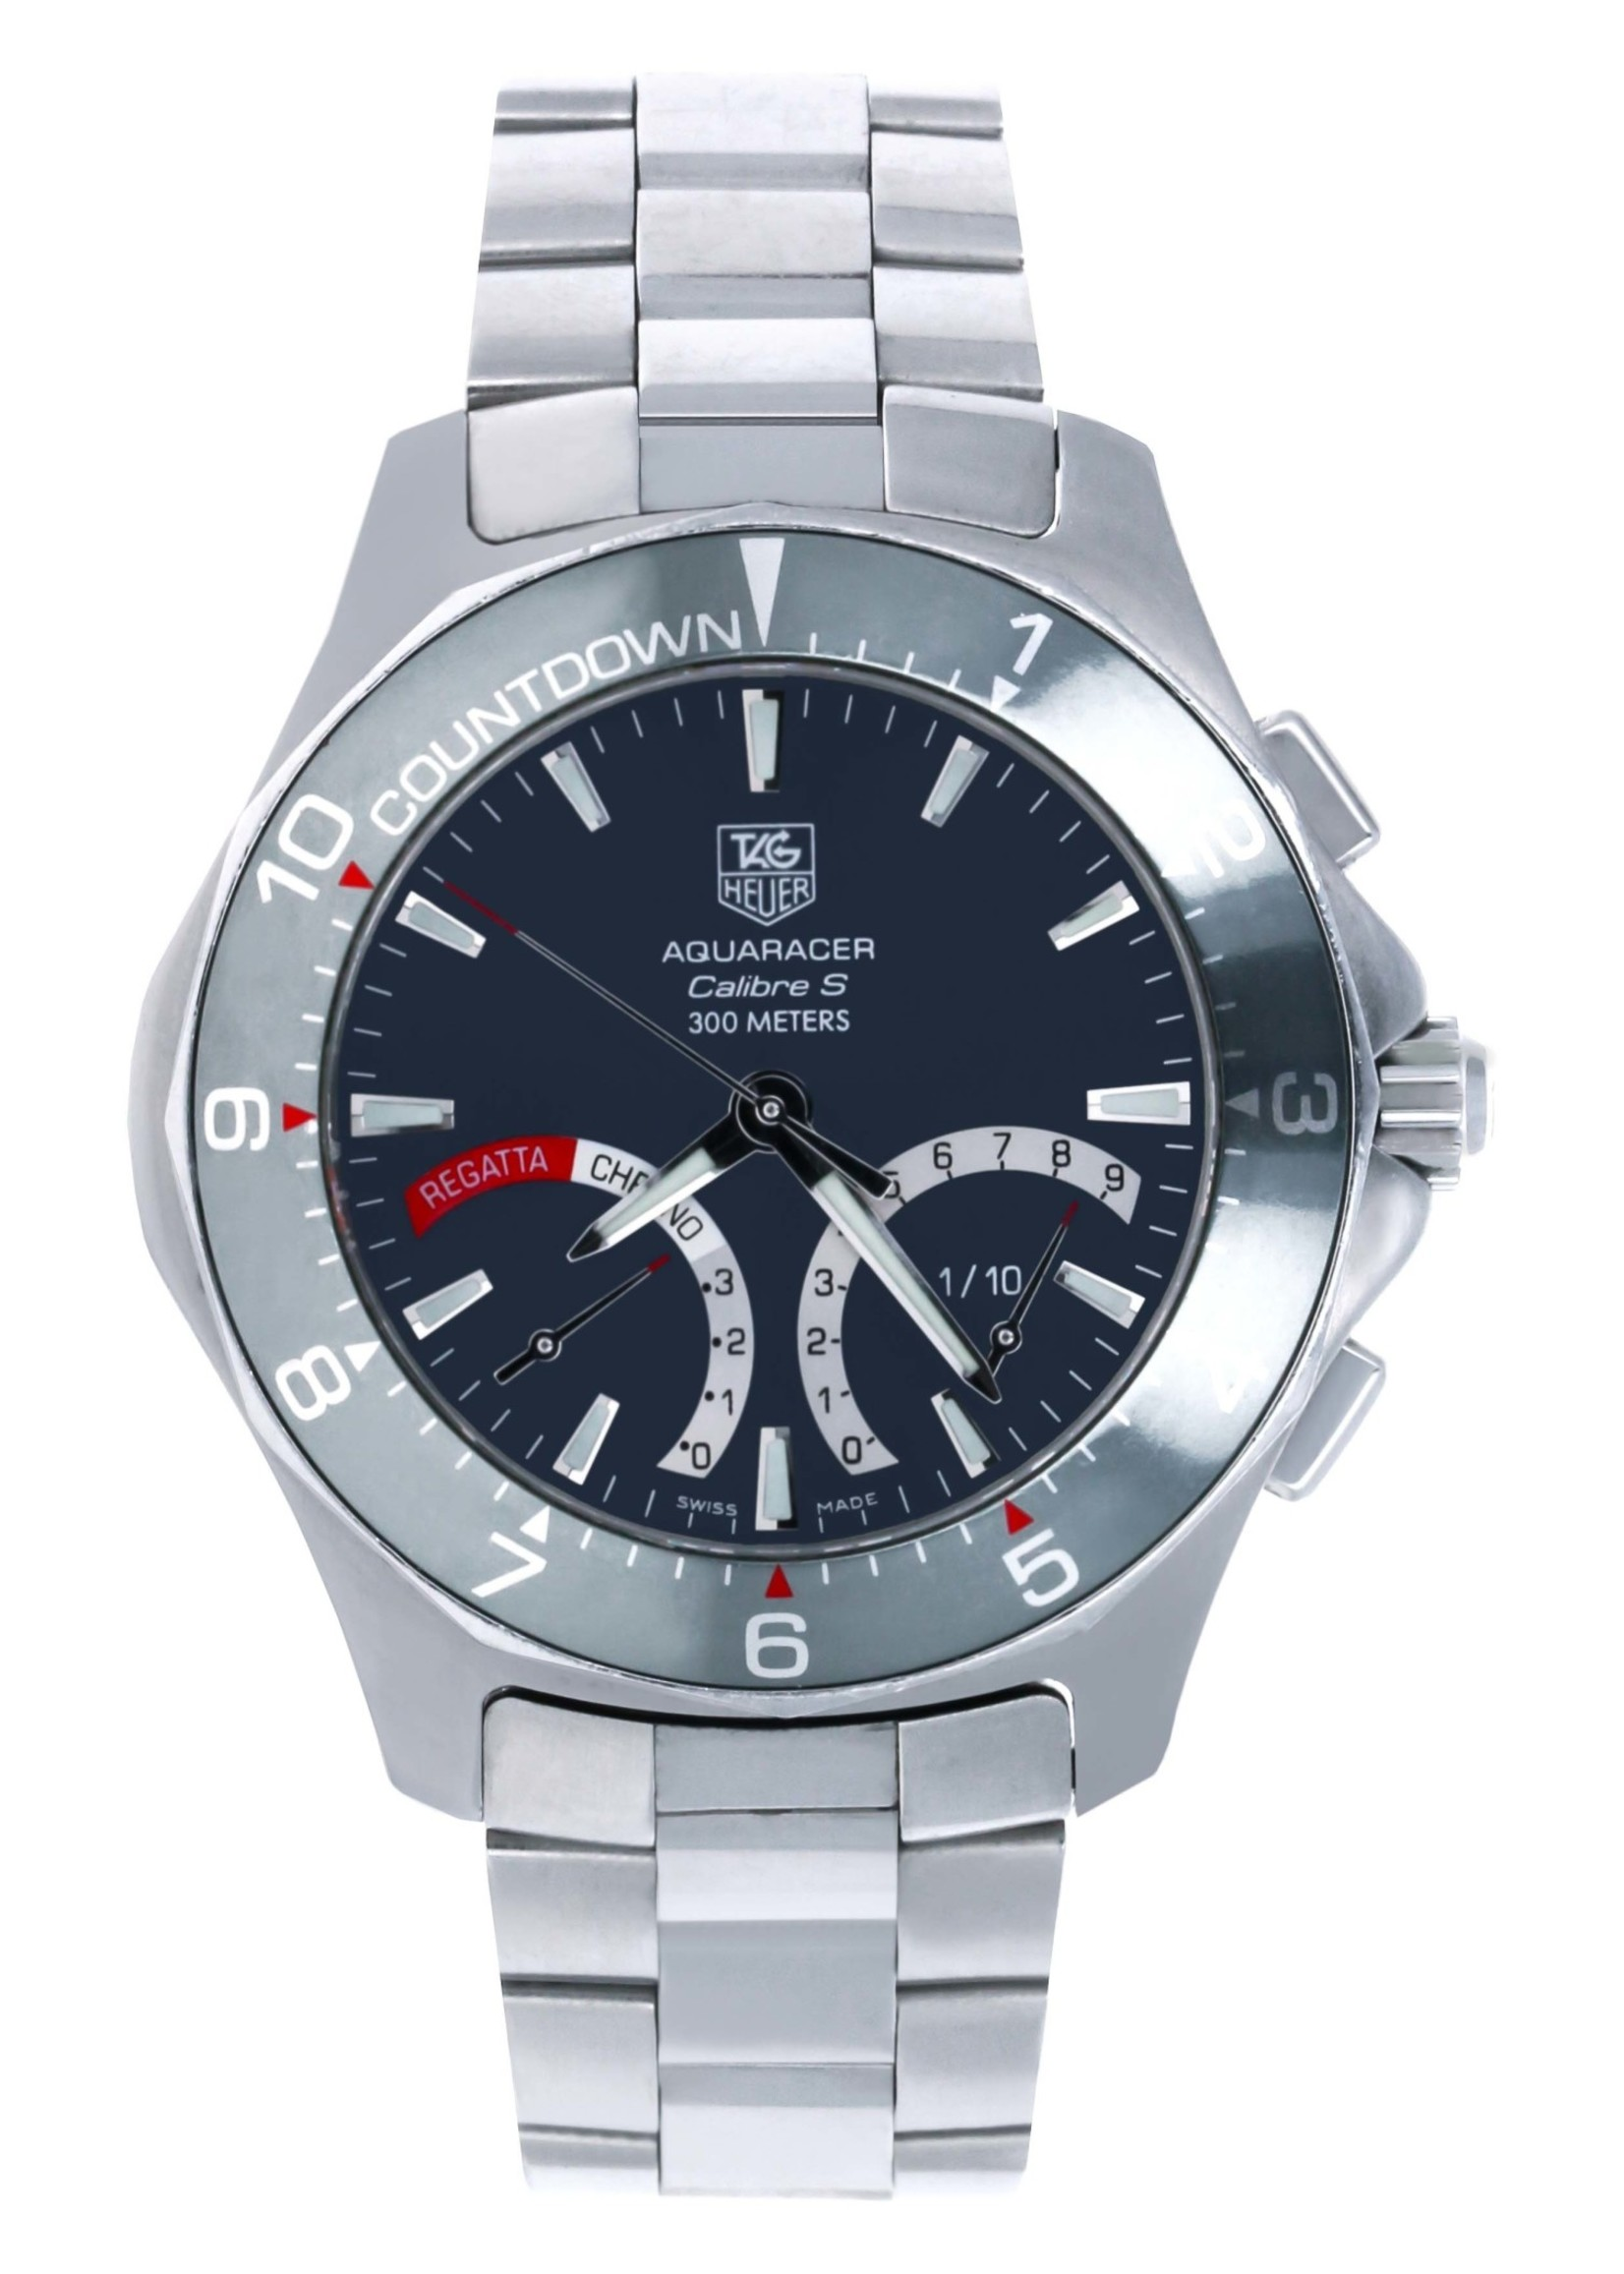 Tag Heuer Watches TAG HEUER AQUARACER CALIBRE S 41MM #CAF7111